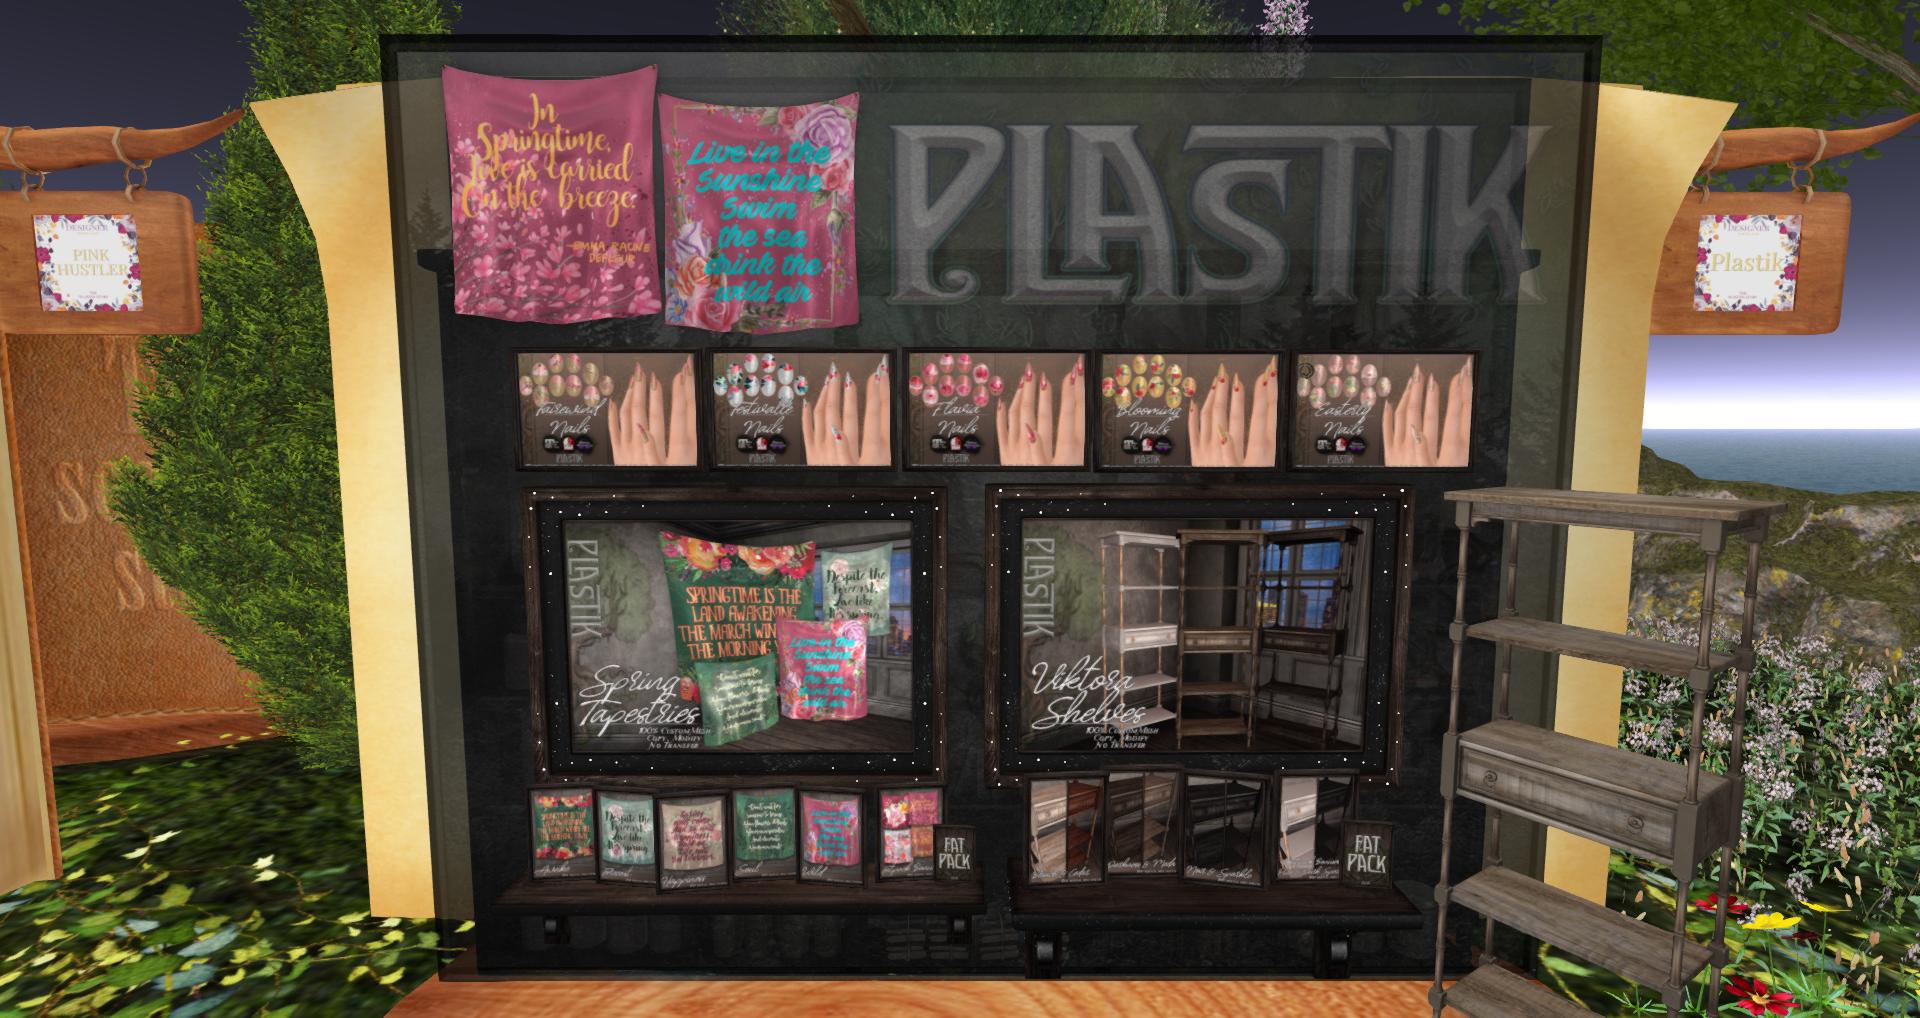 Plastik_001.png